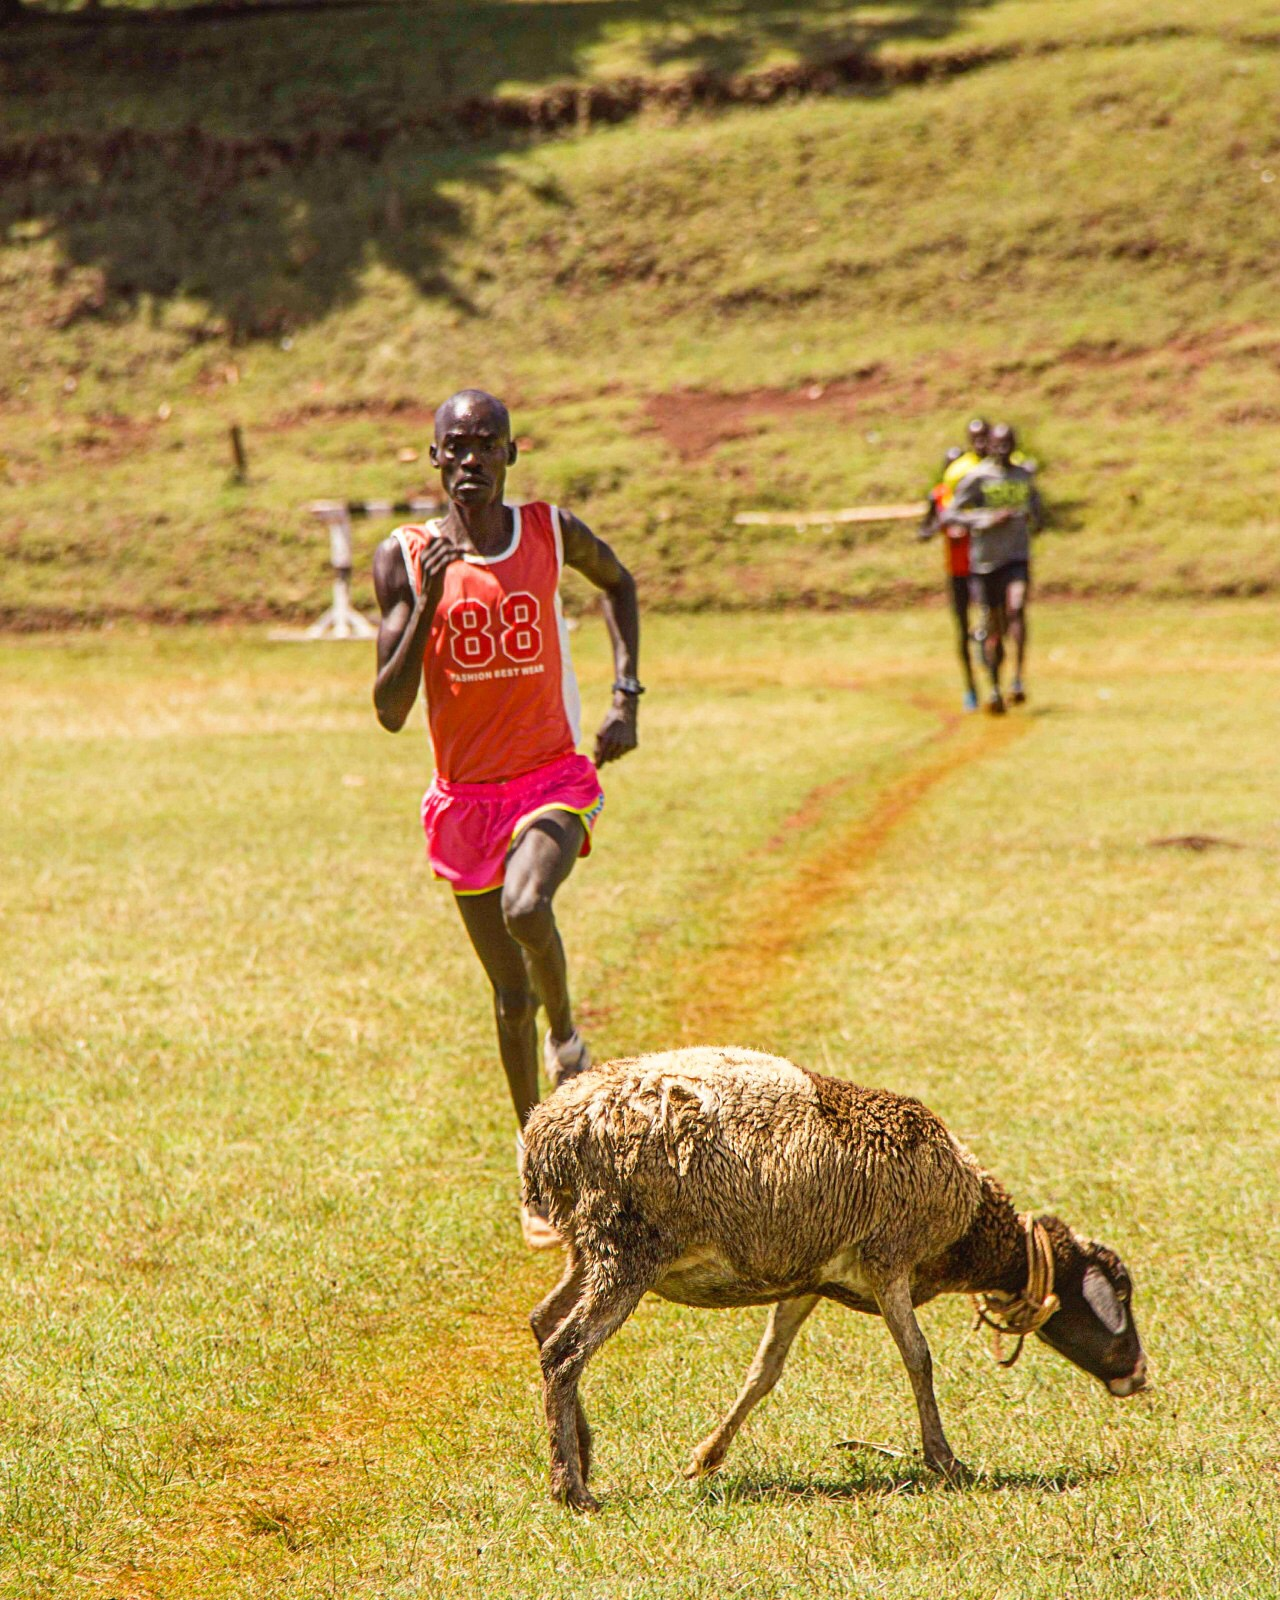 Training athlete. Kamariny stadium. Iten. Kenya by behankieran